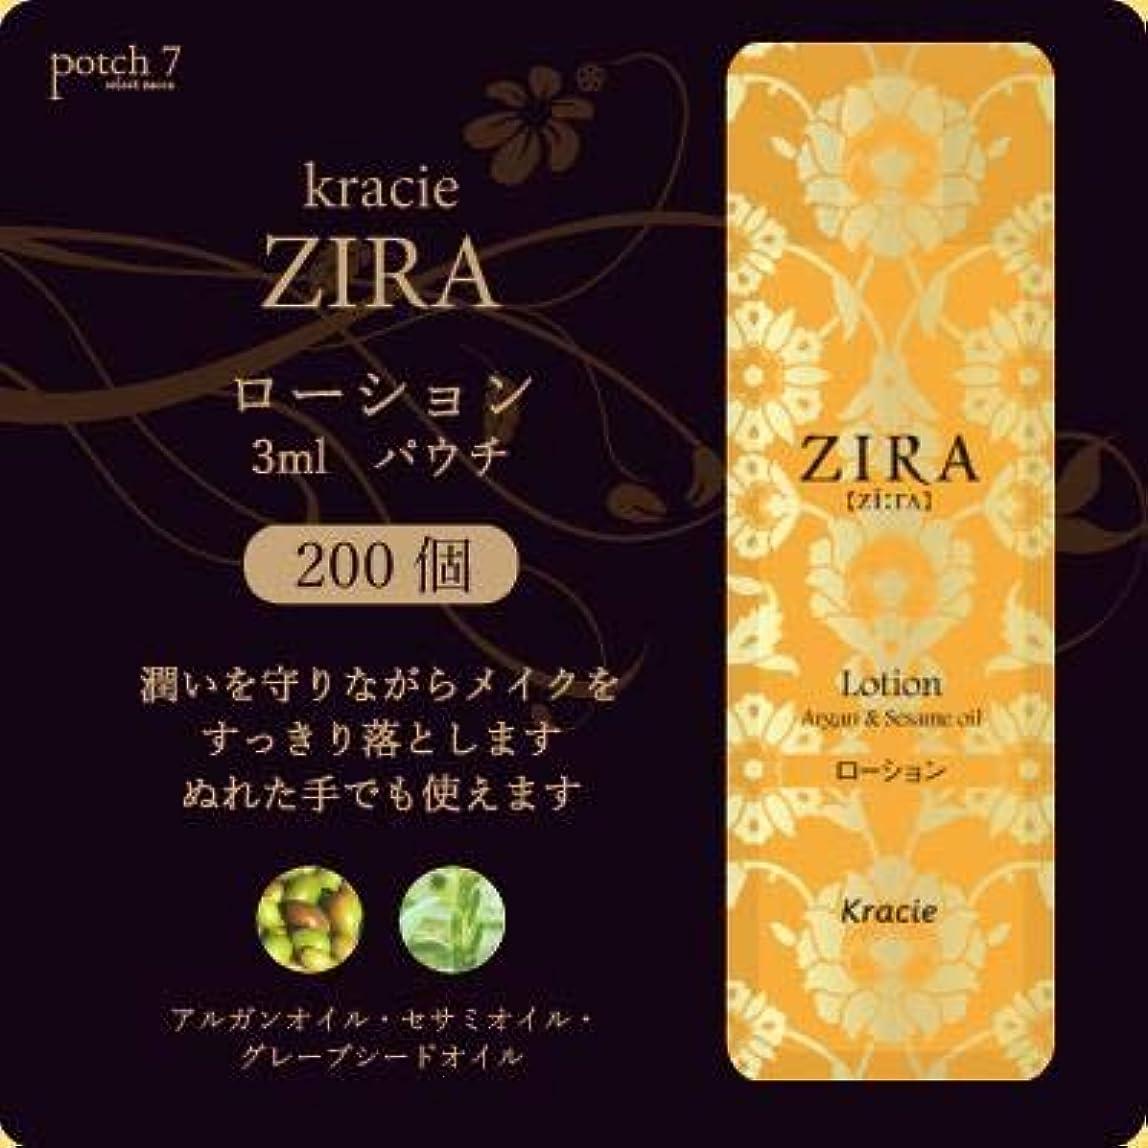 Kracie クラシエ ZIRA ジーラ ローション 化粧水 パウチ 3ml 200個入